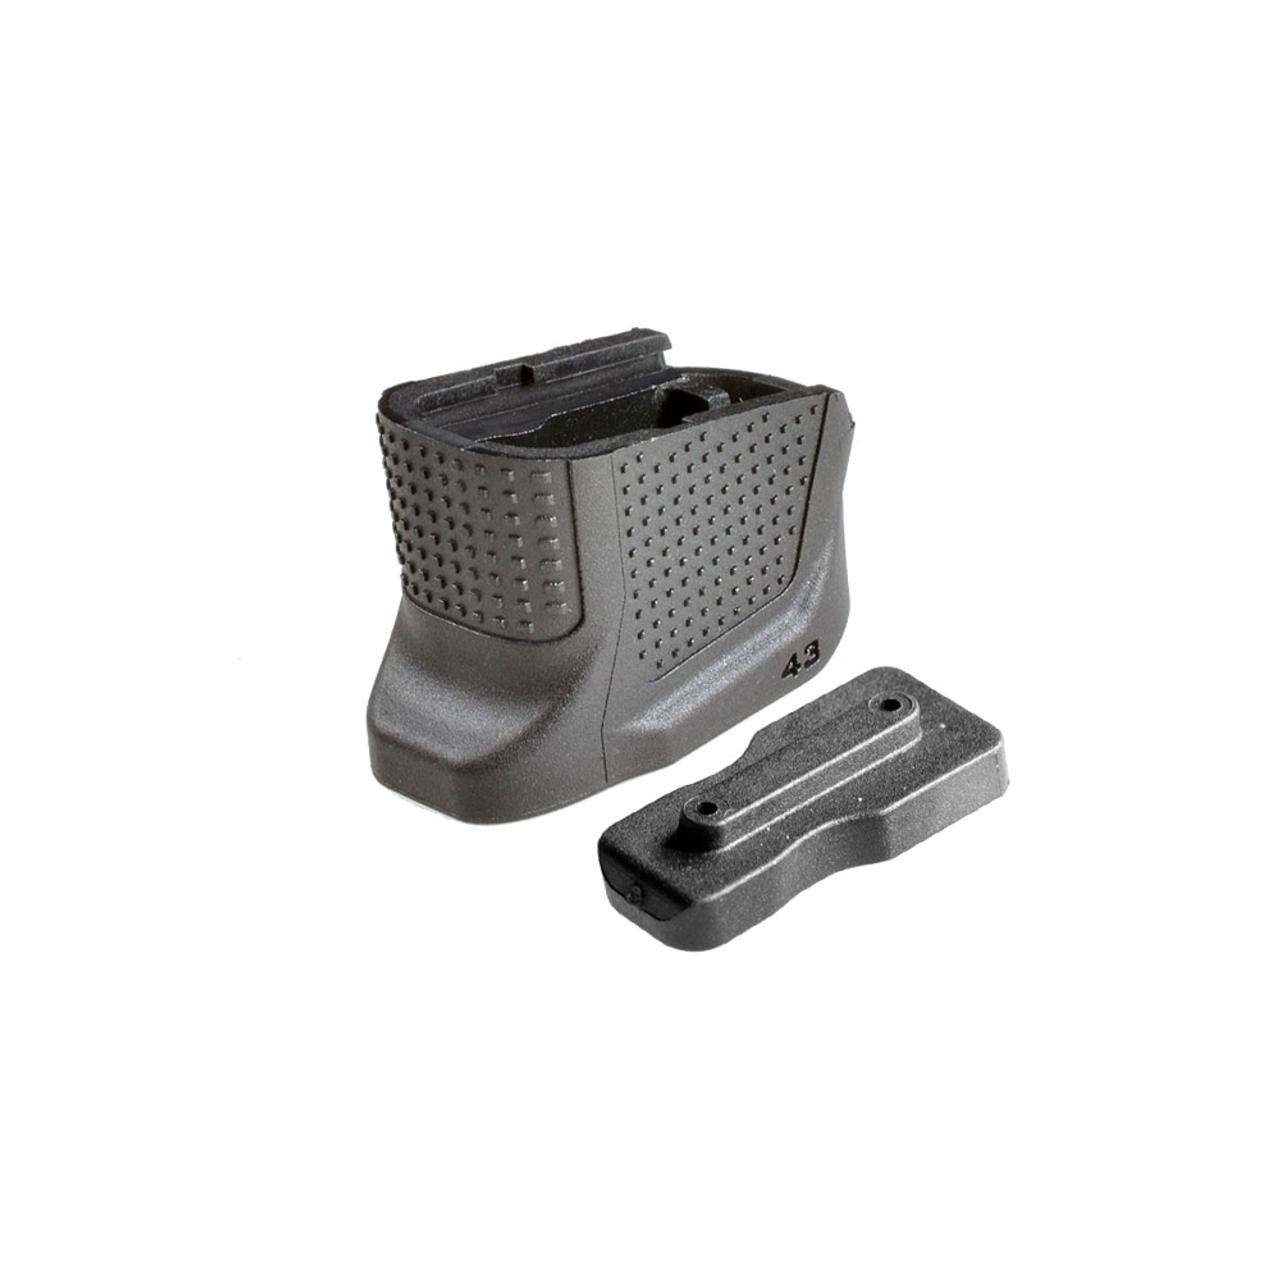 Strike Industries Enhanced Magazine Plate for Glock G42 - Black, Strike Industries Parts, Glock Magazine Base Plate